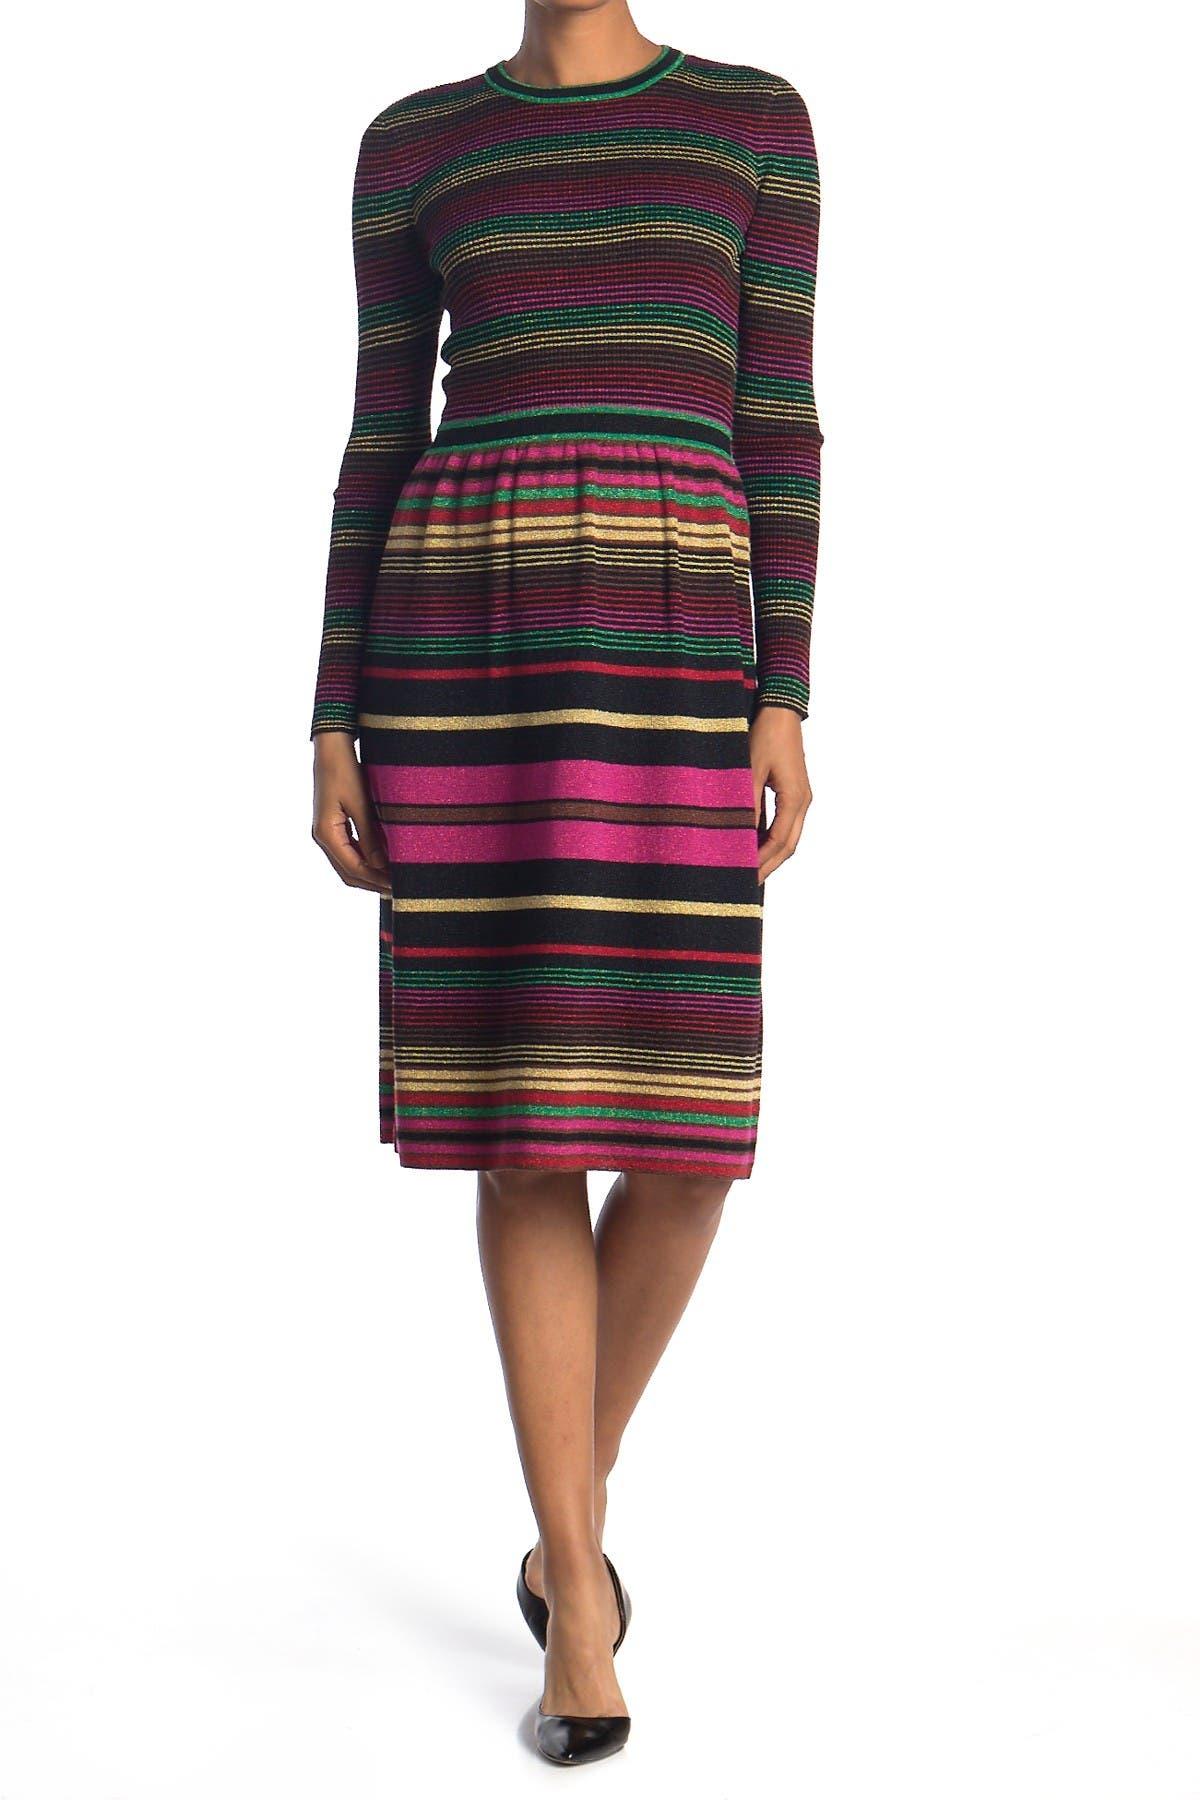 Image of Trina Turk Ikigai Stripe Sweater Dress